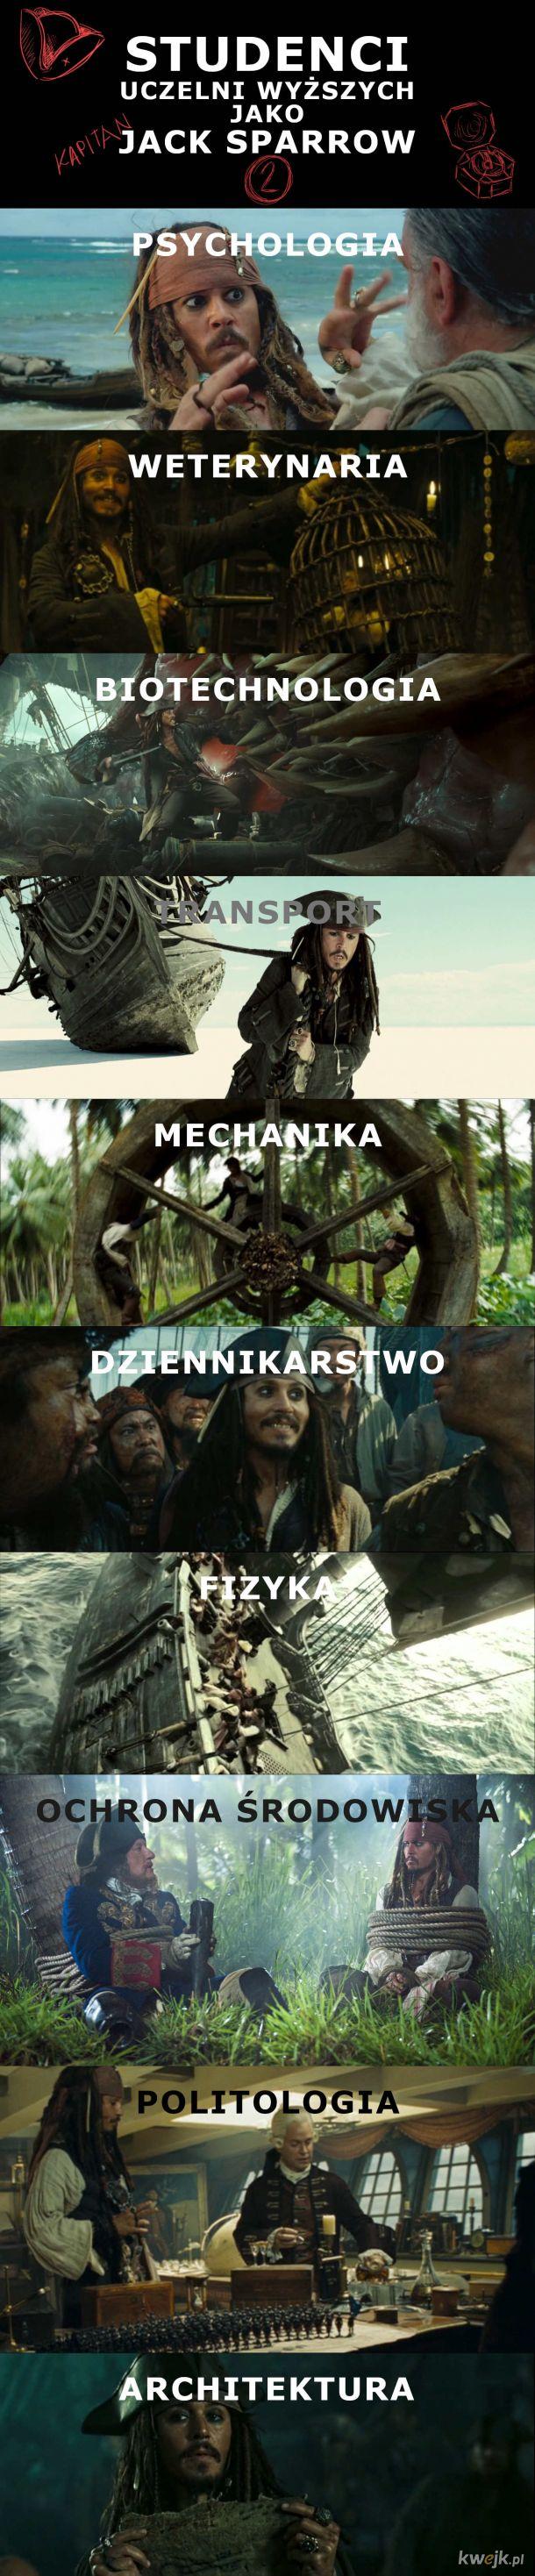 Studenci jako Jack Sparrow 2